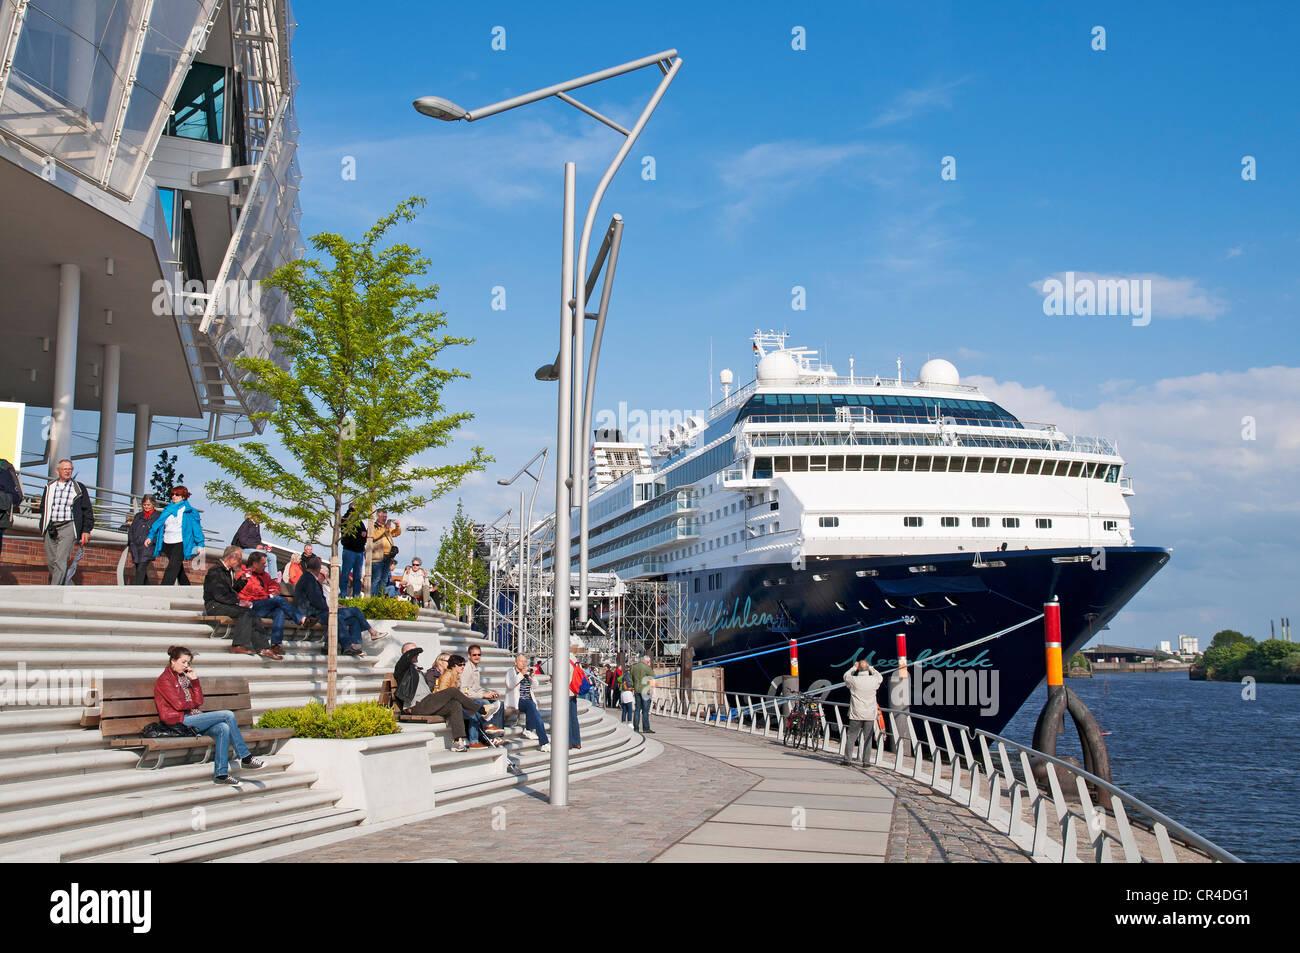 Cruise liner 'Mein Schiff 2' moored at the cruise terminal in Hamburg's HafenCity, Hamburg, Germany, - Stock Image